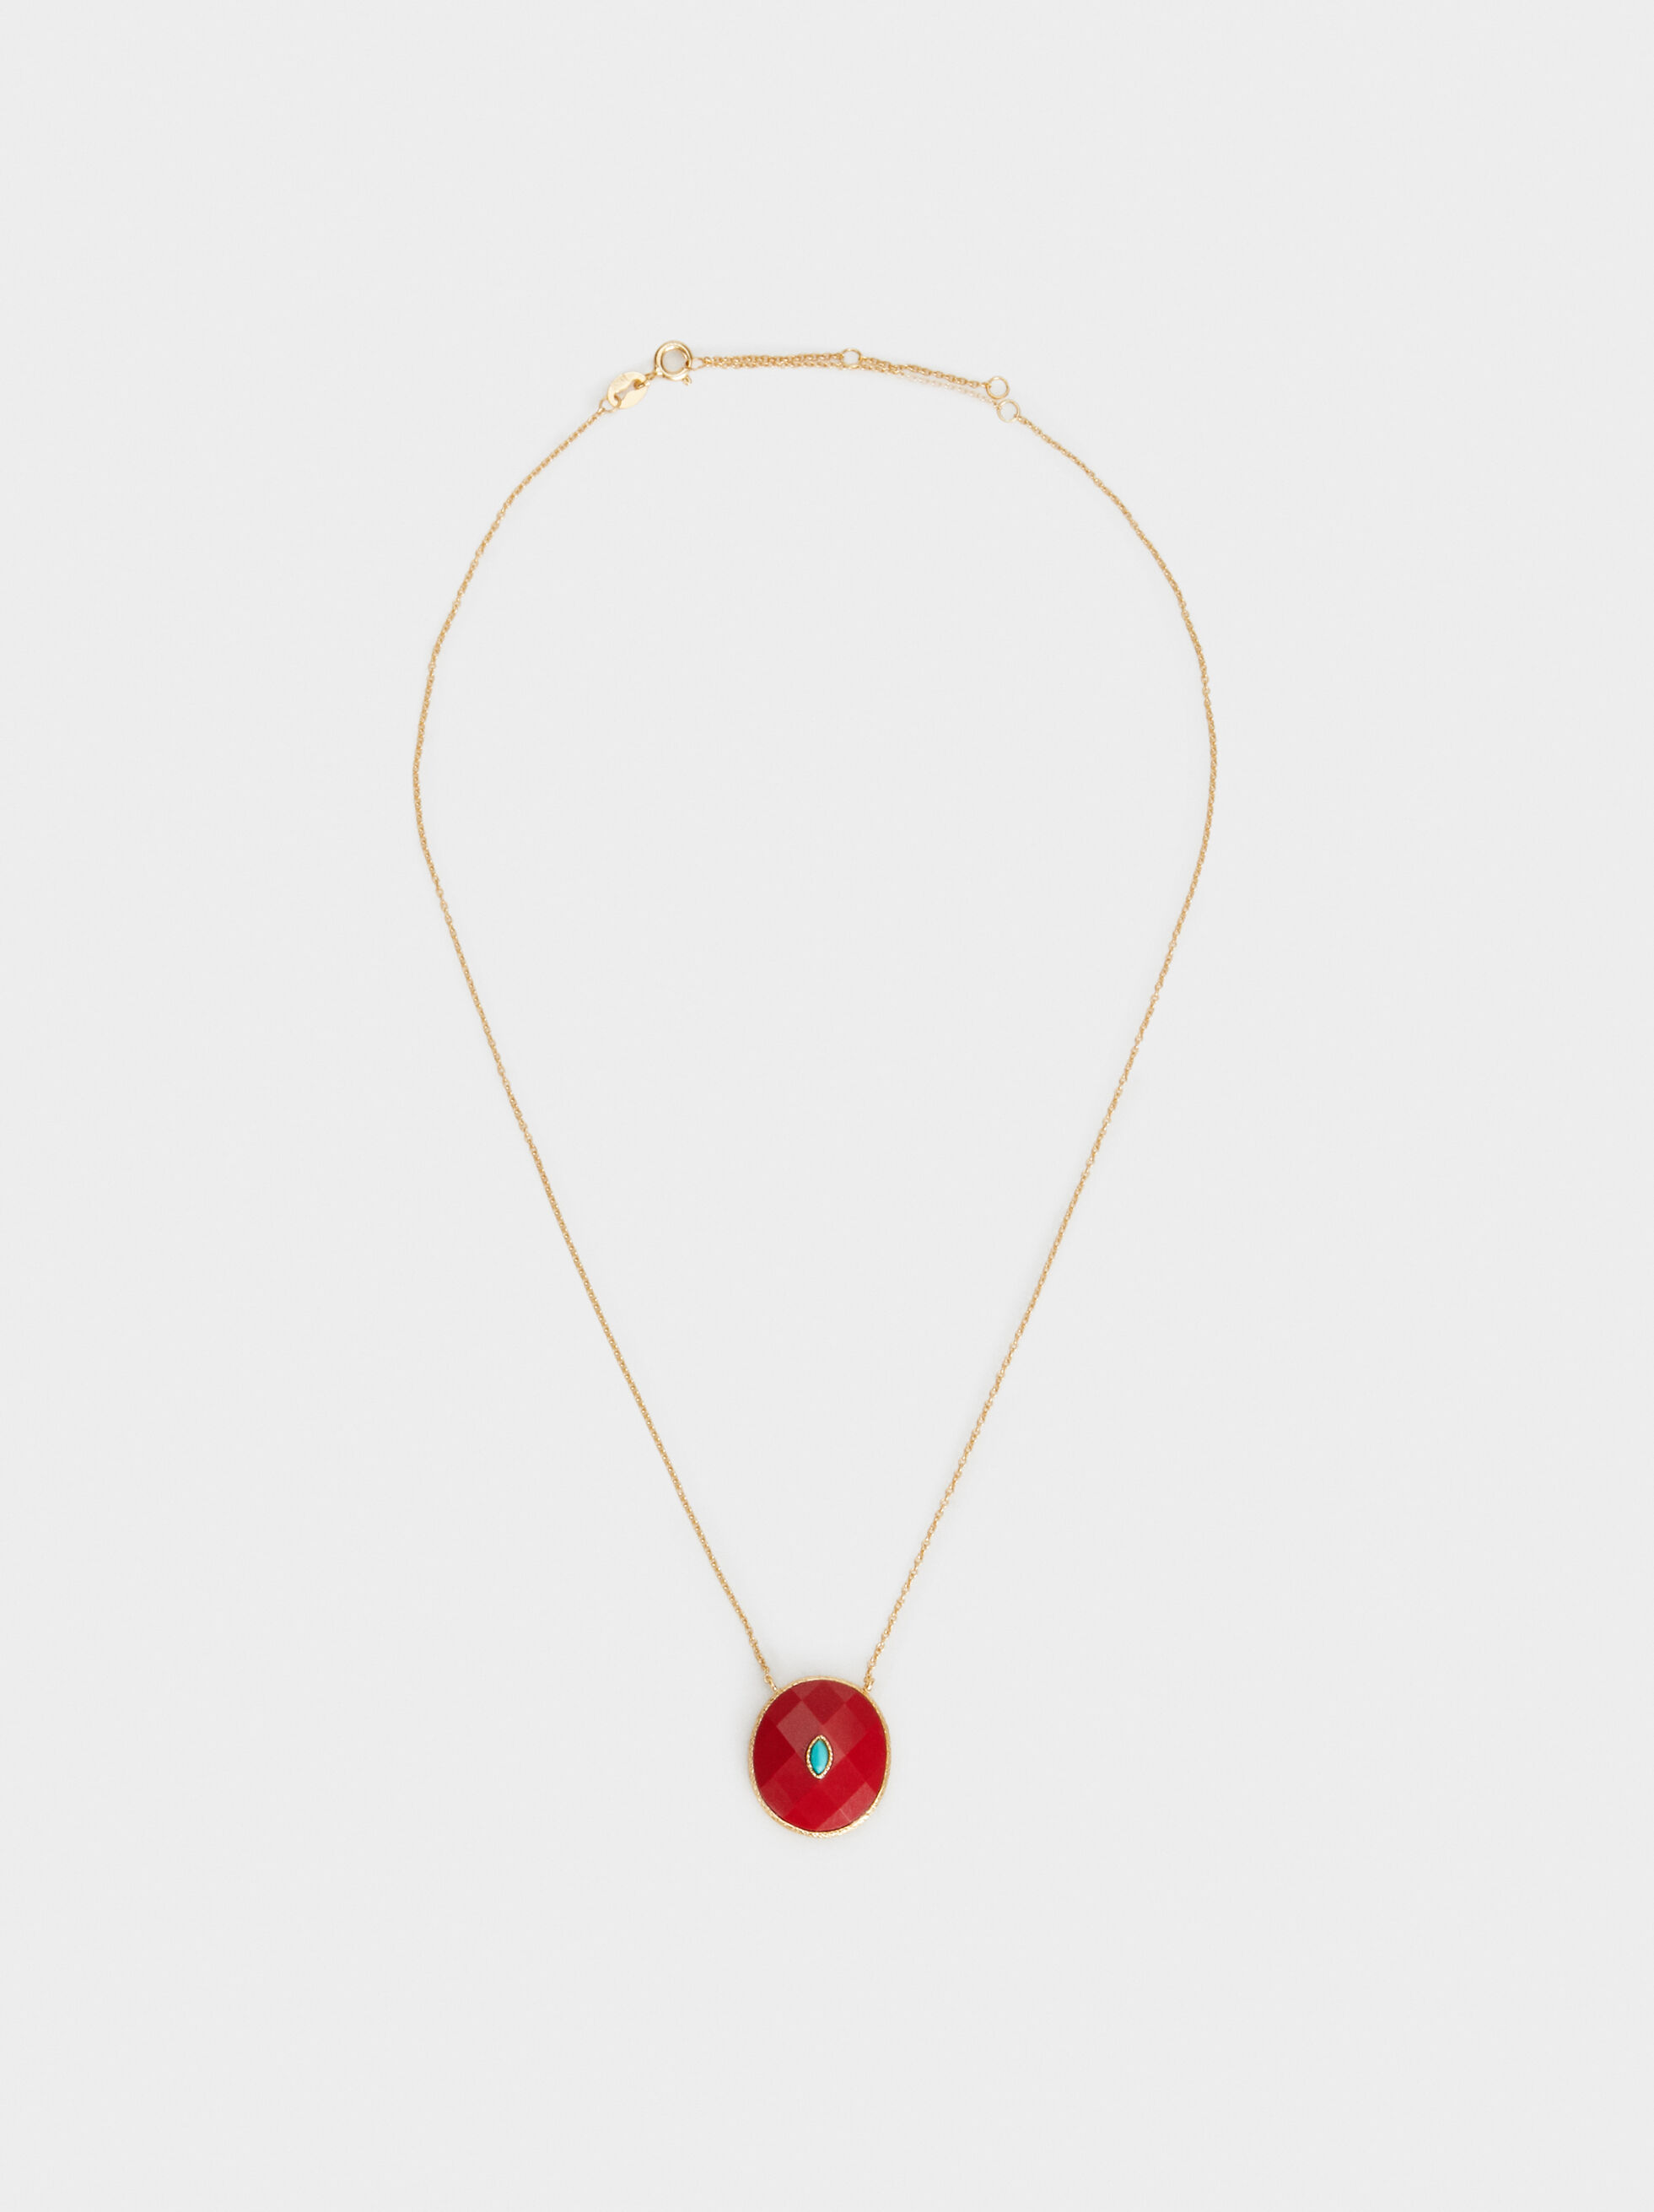 Short 925 Sterling Silver Pendant Necklace, , hi-res